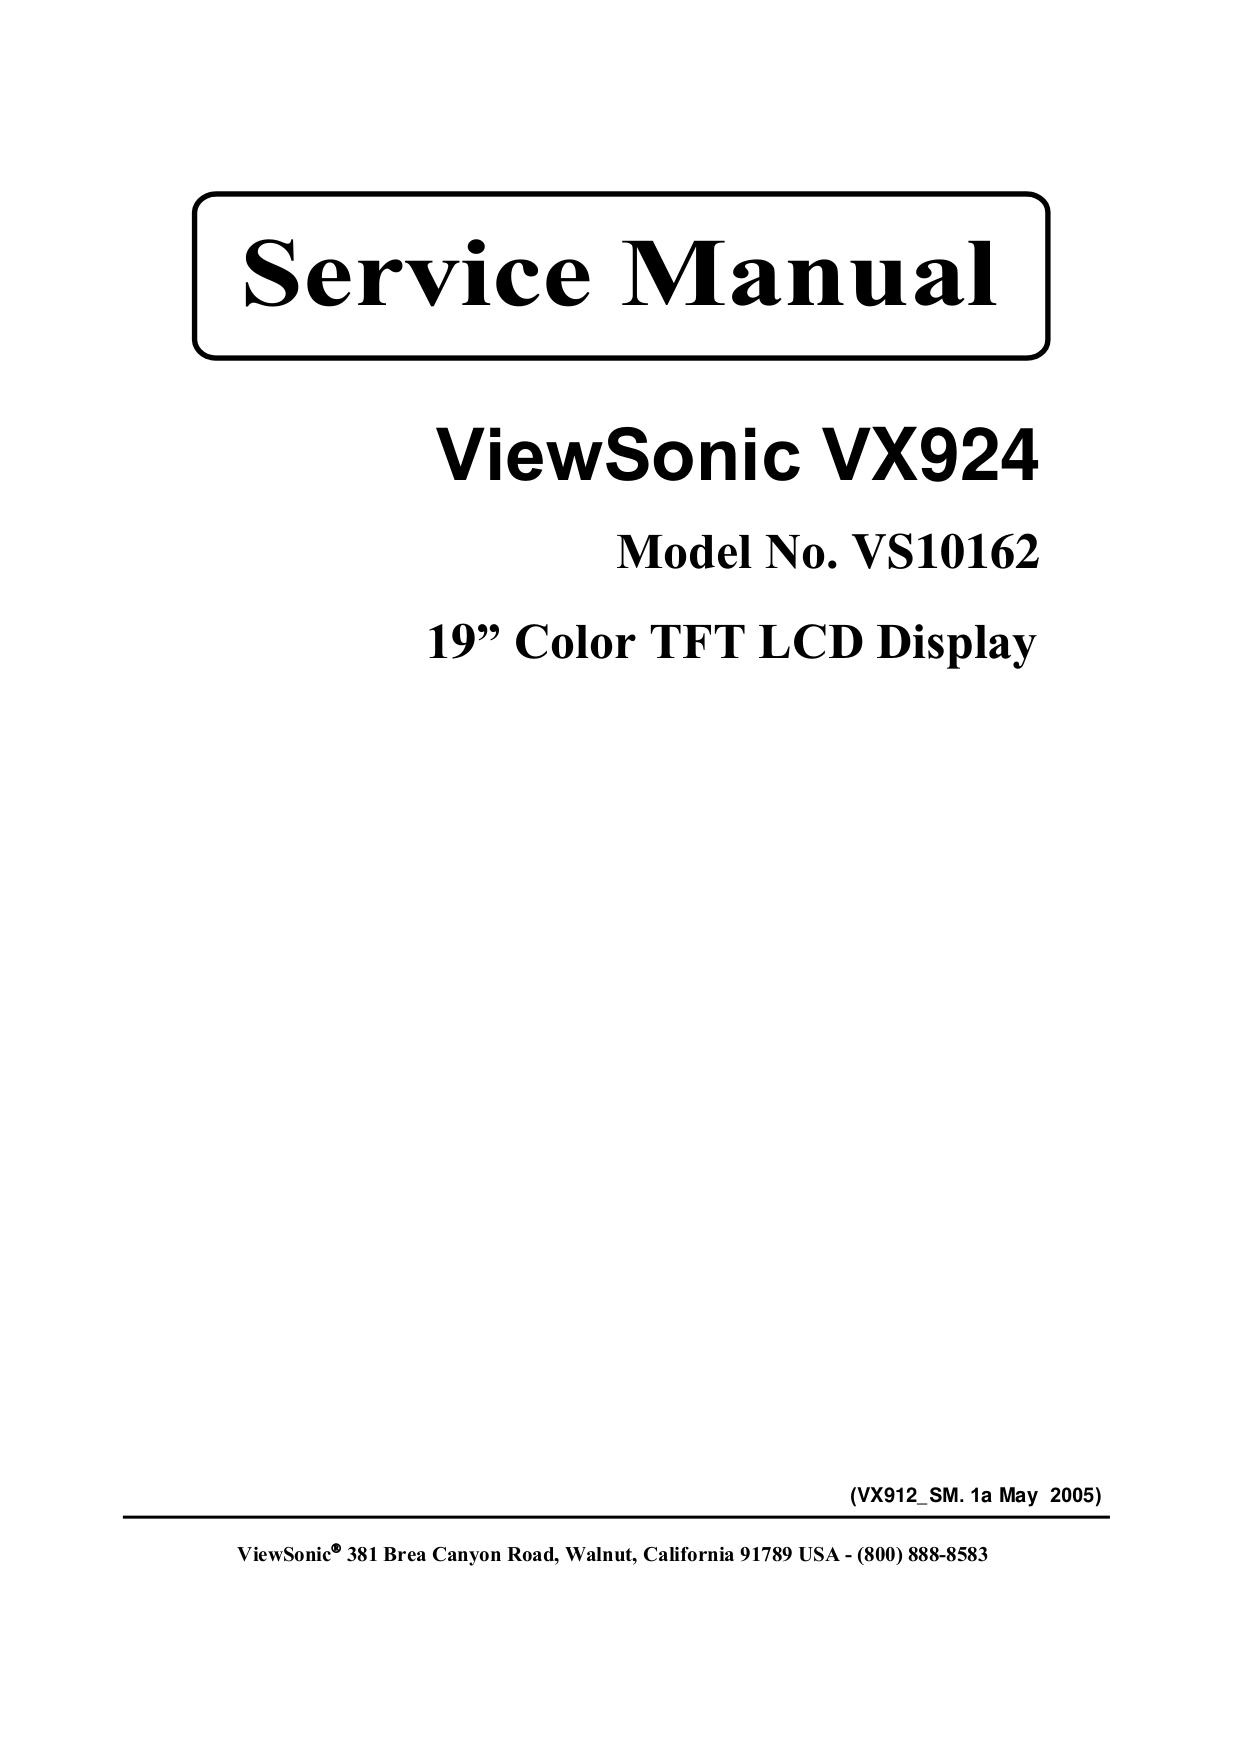 Download free pdf for Viewsonic VG150 Monitor manual